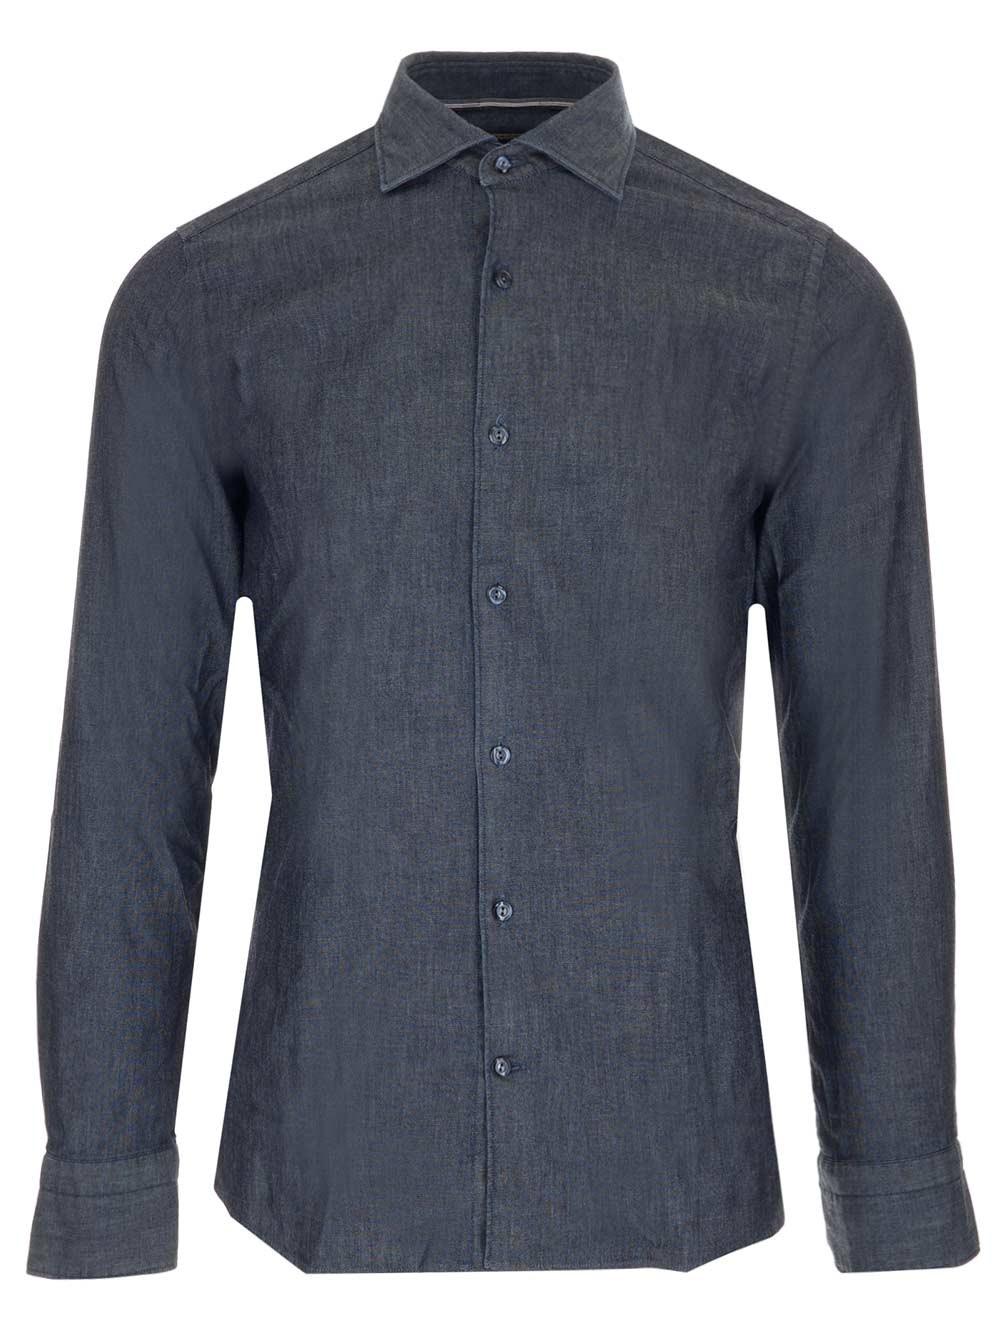 AL DUCA D'AOSTA 1902 Dark Blue Chambray Shirt